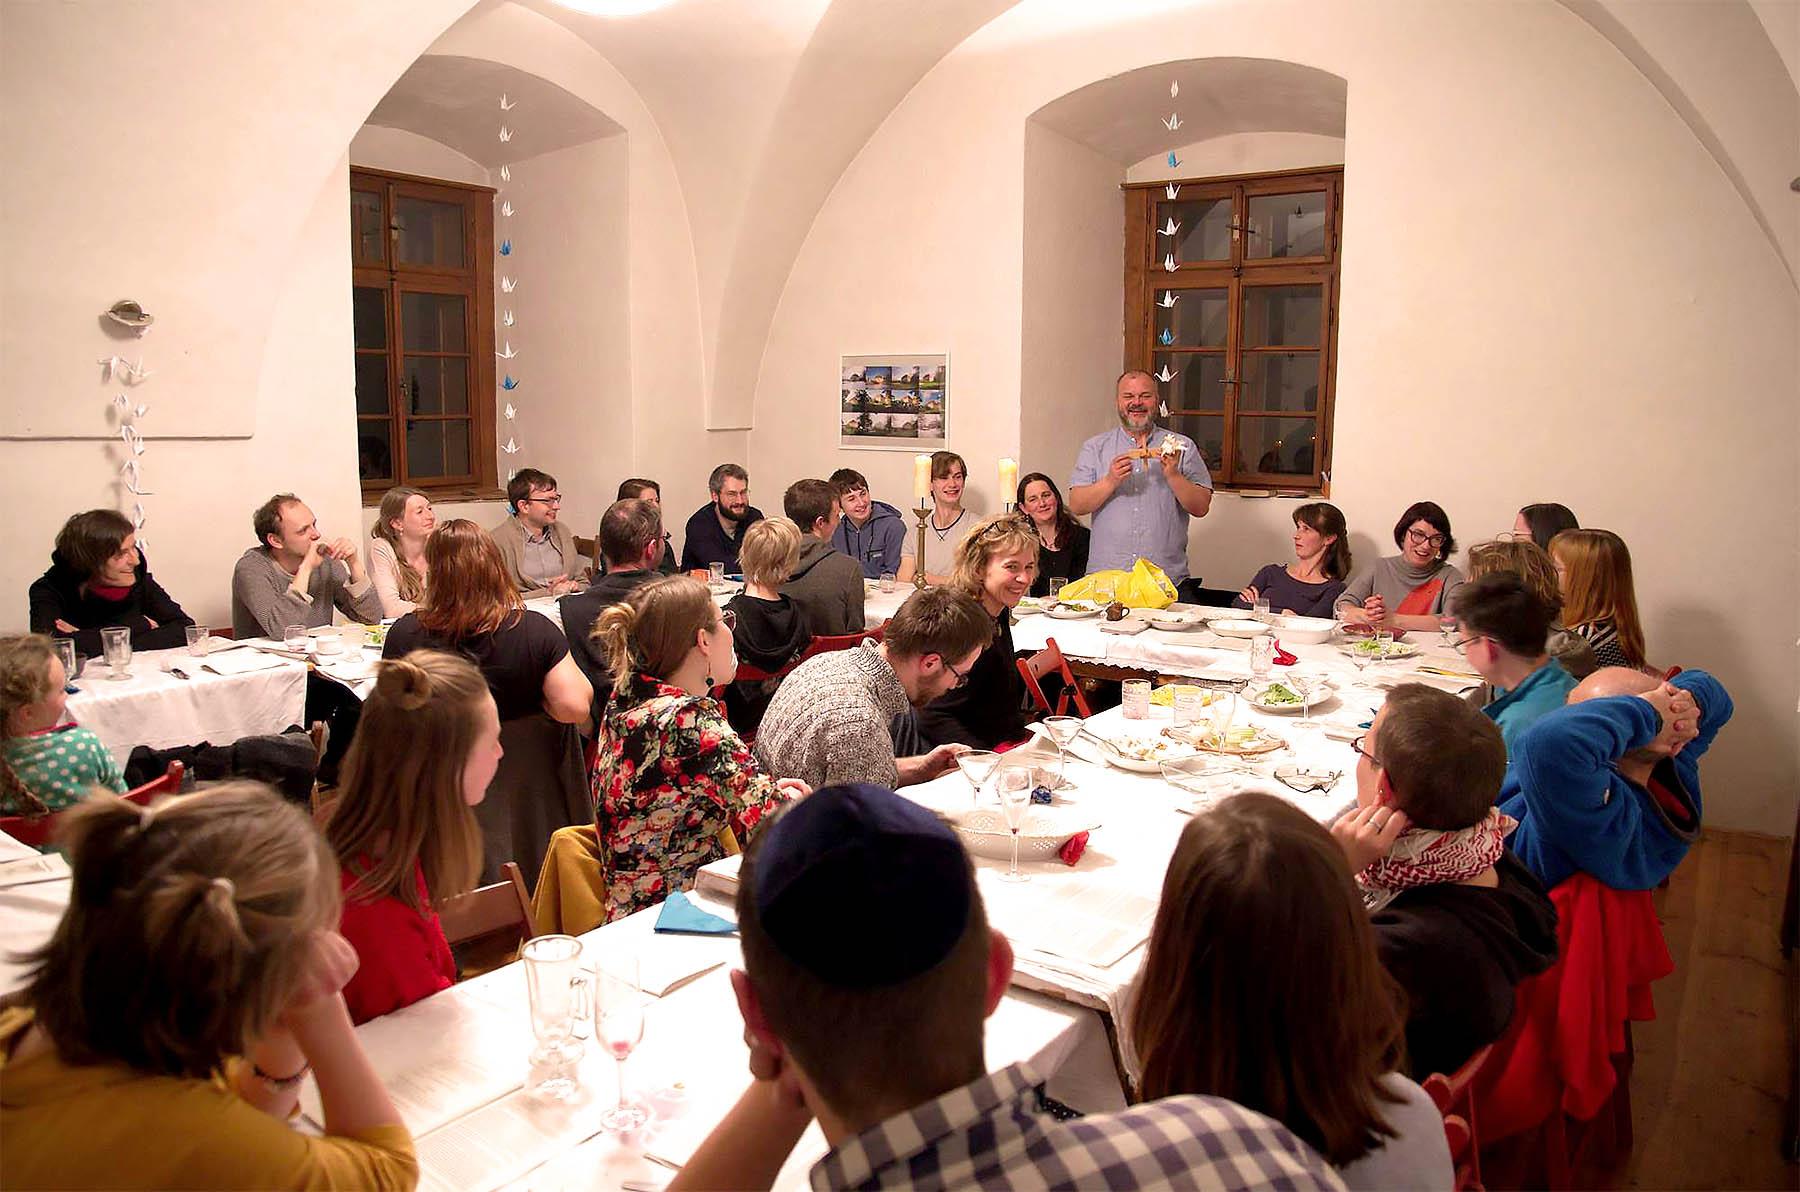 Seder Pesach v Holostrevech 2019